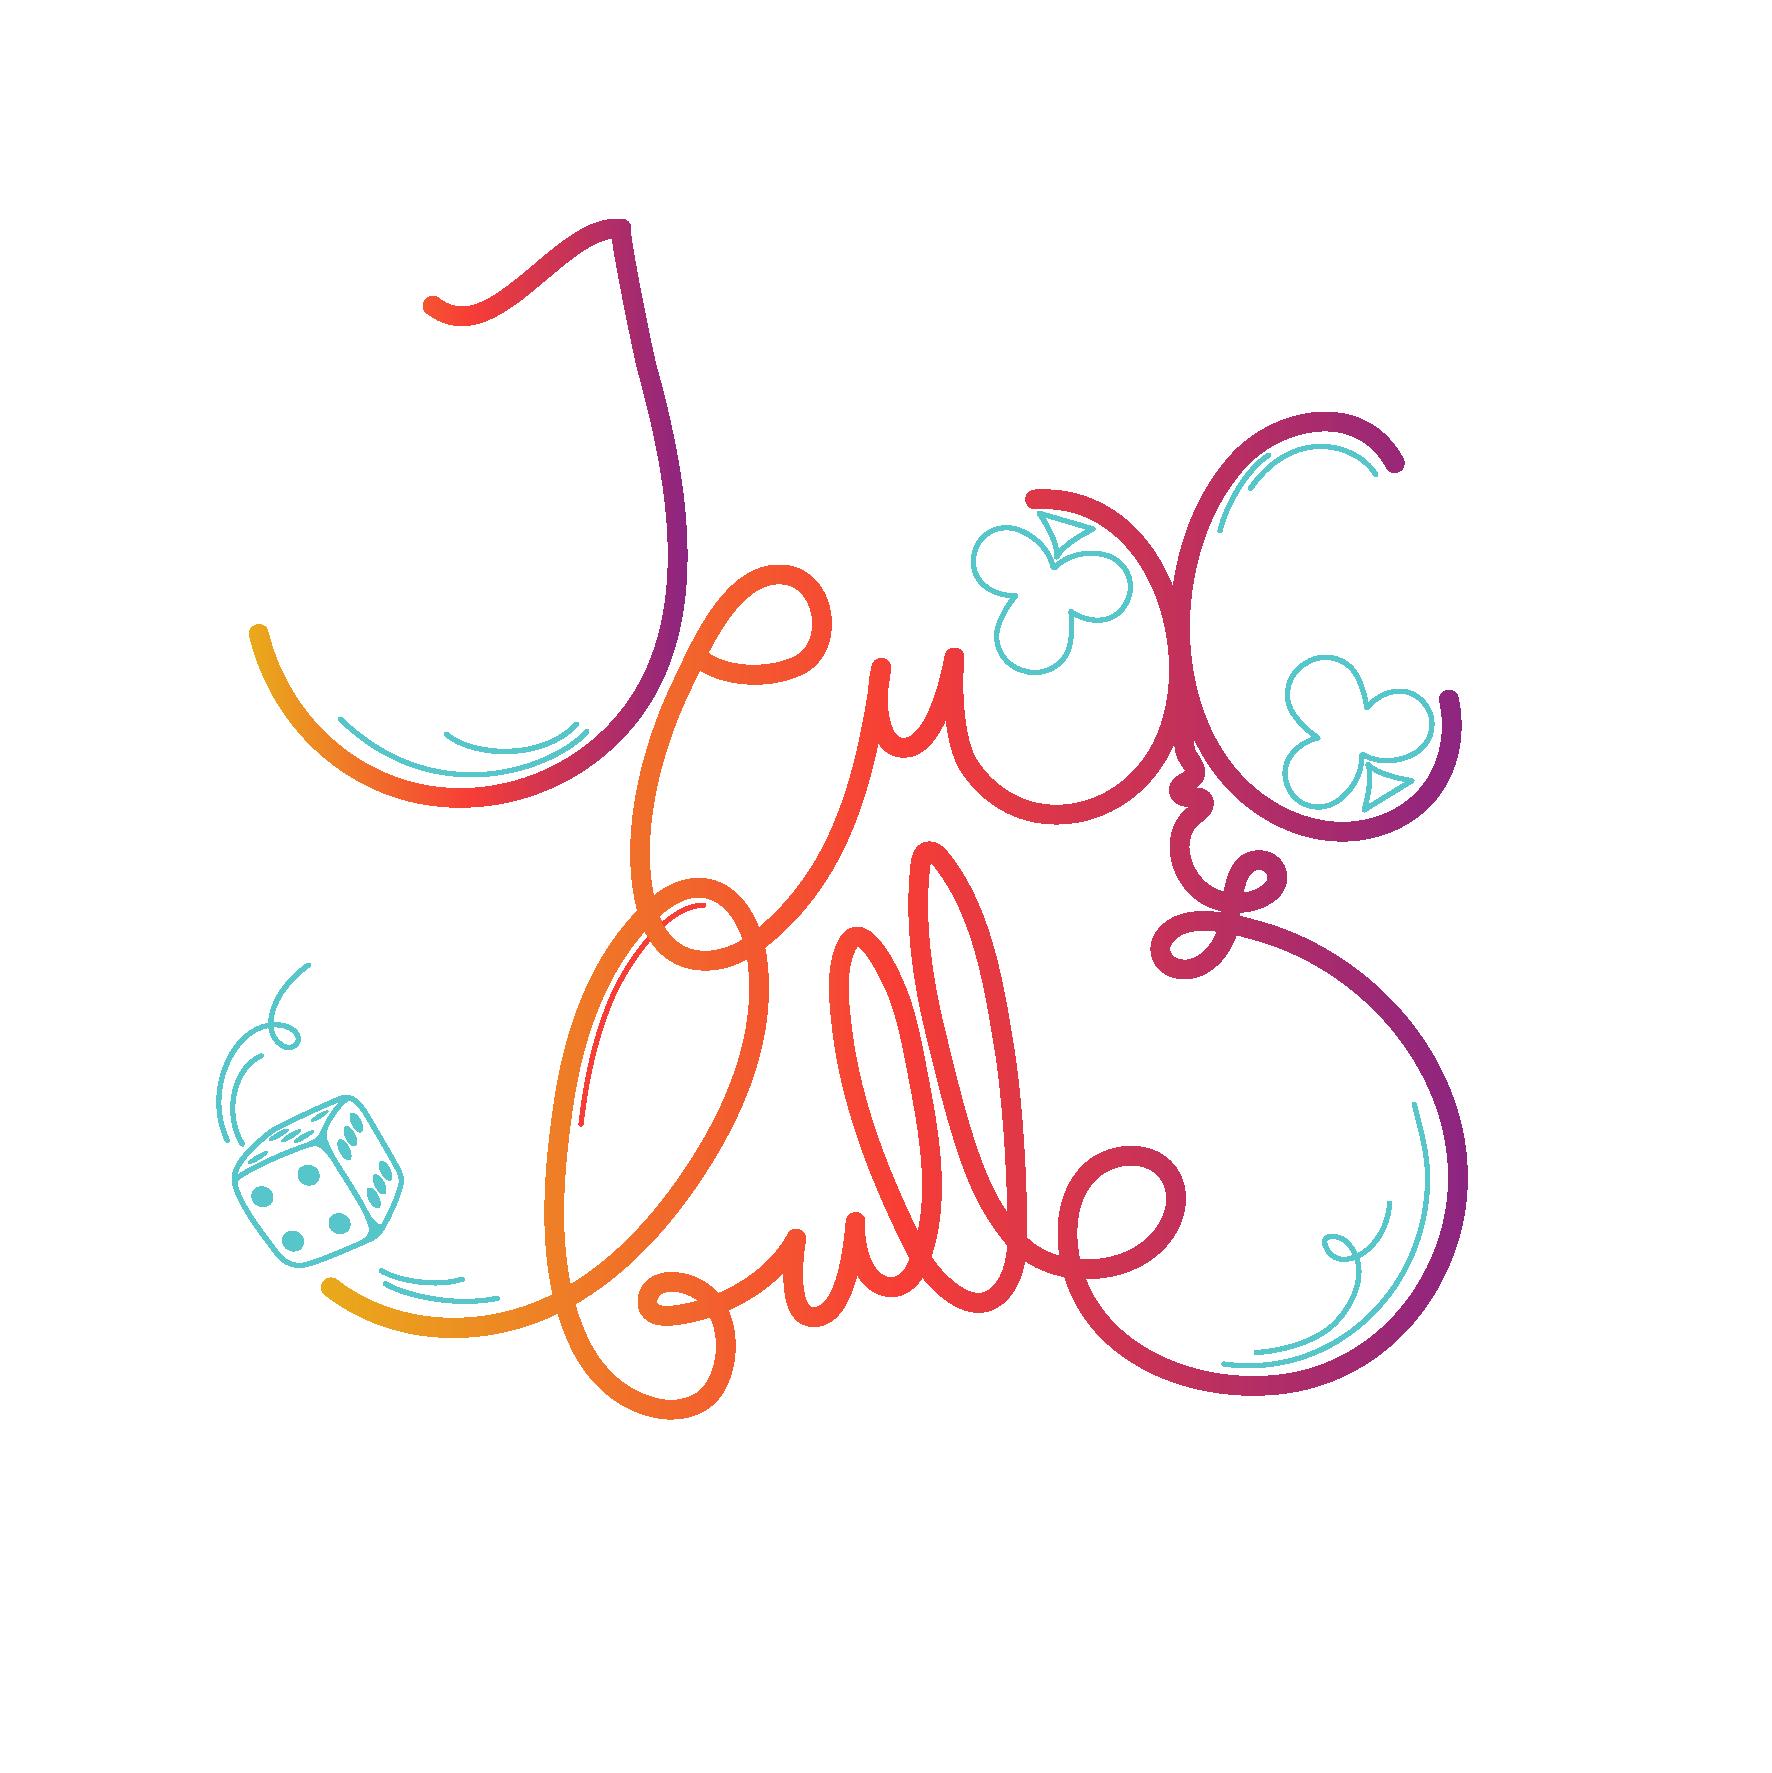 logo jeux bulle